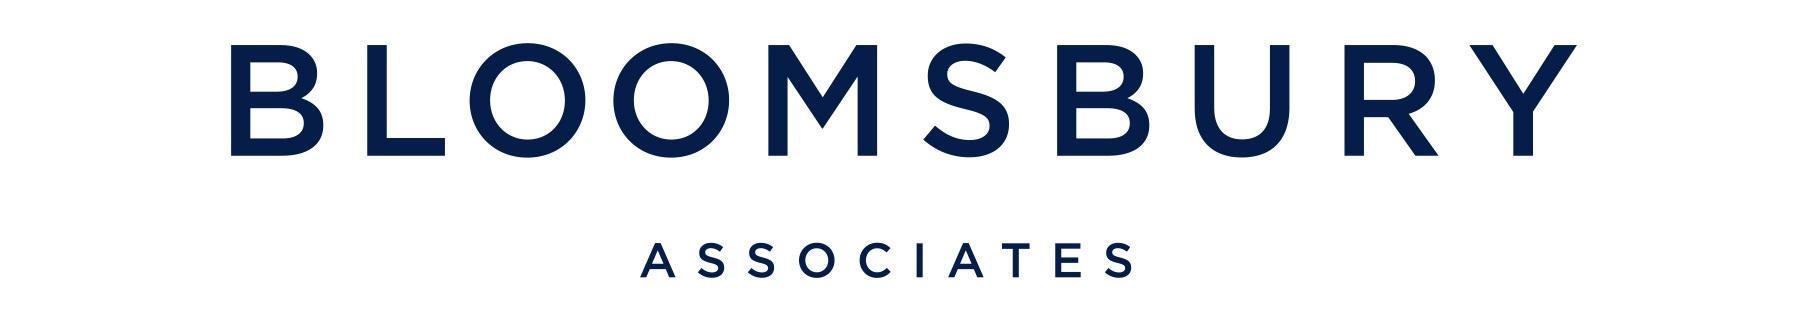 Bloomsbury Associates